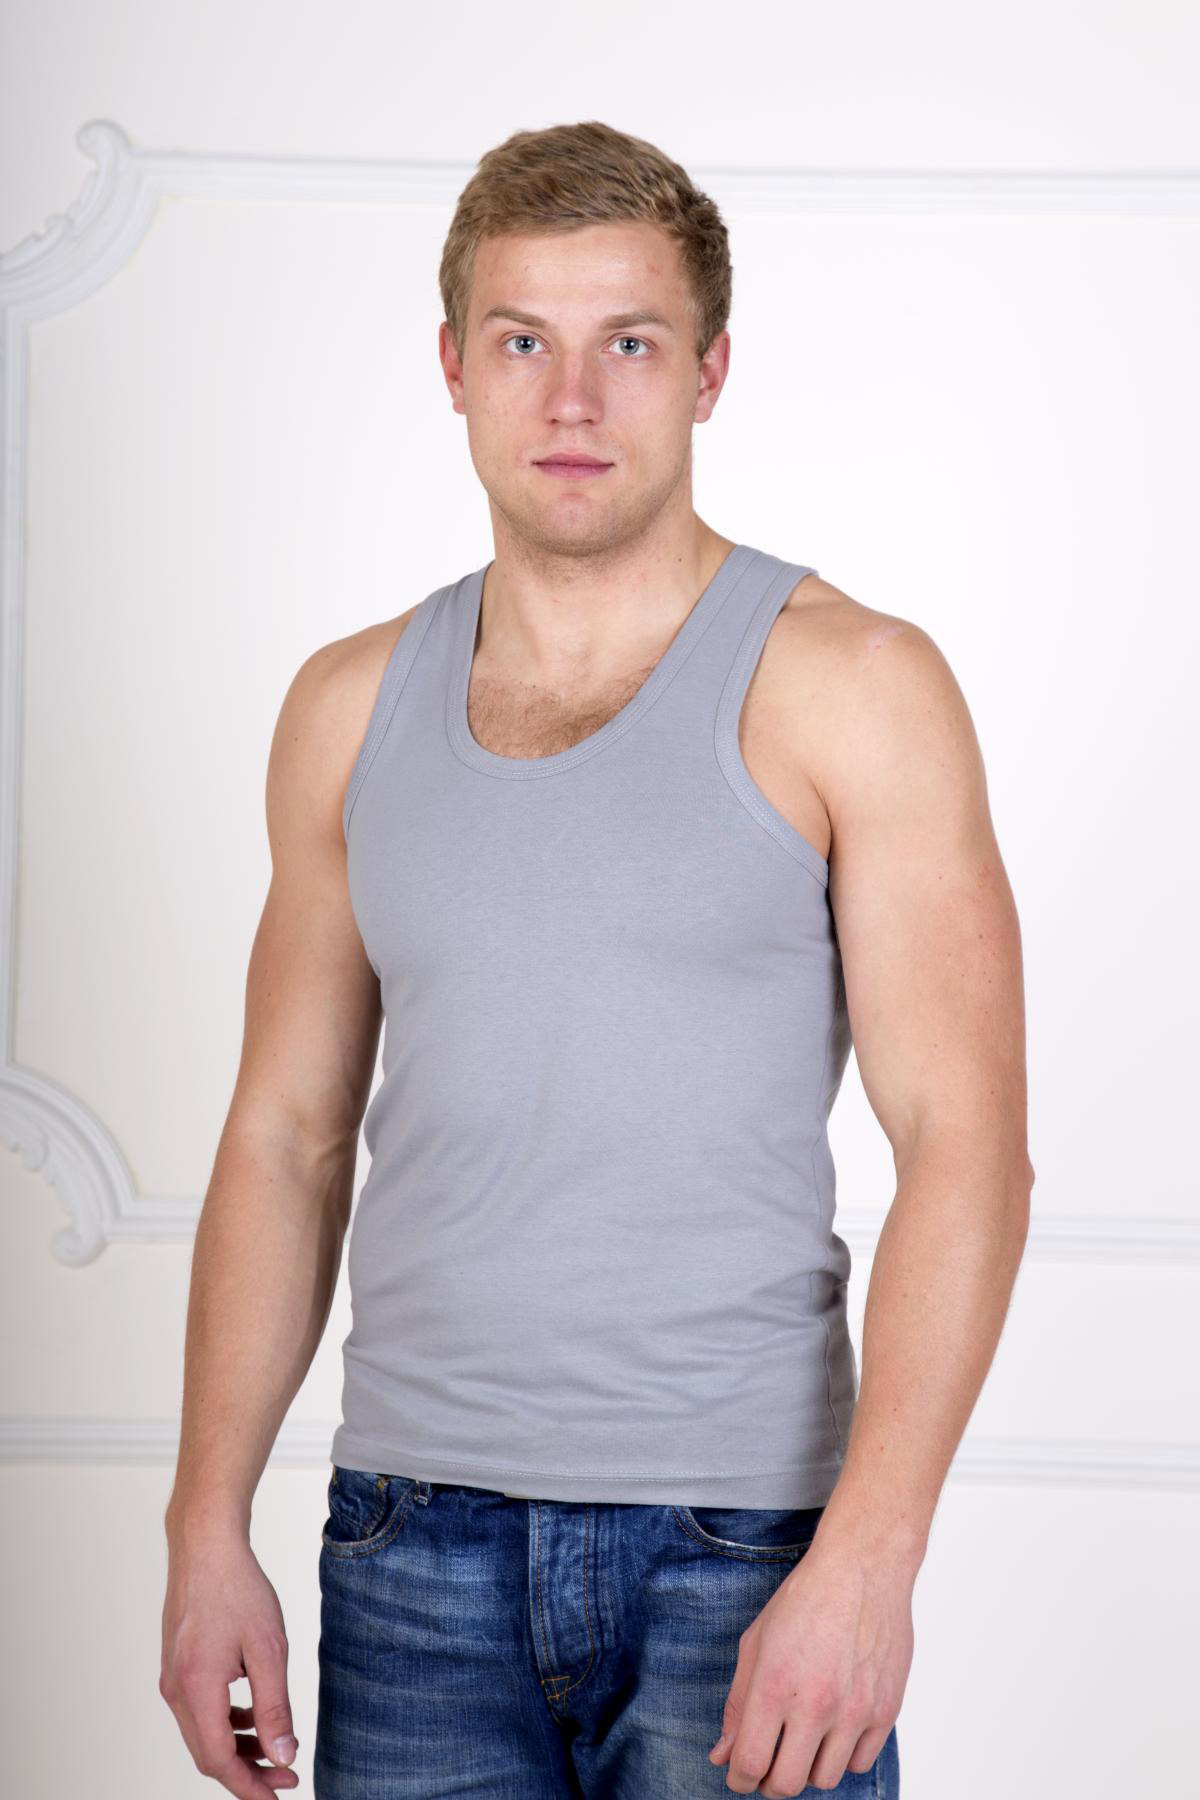 Муж. майка Верн Серый р. 48Майки и футболки<br>Факт. ОГ: 86 см <br>Факт. ОТ: 84 см <br>Факт. ОБ: 86 см <br>Длина по спинке: 70 см<br><br>Тип: Муж. майка<br>Размер: 48<br>Материал: Кулирка